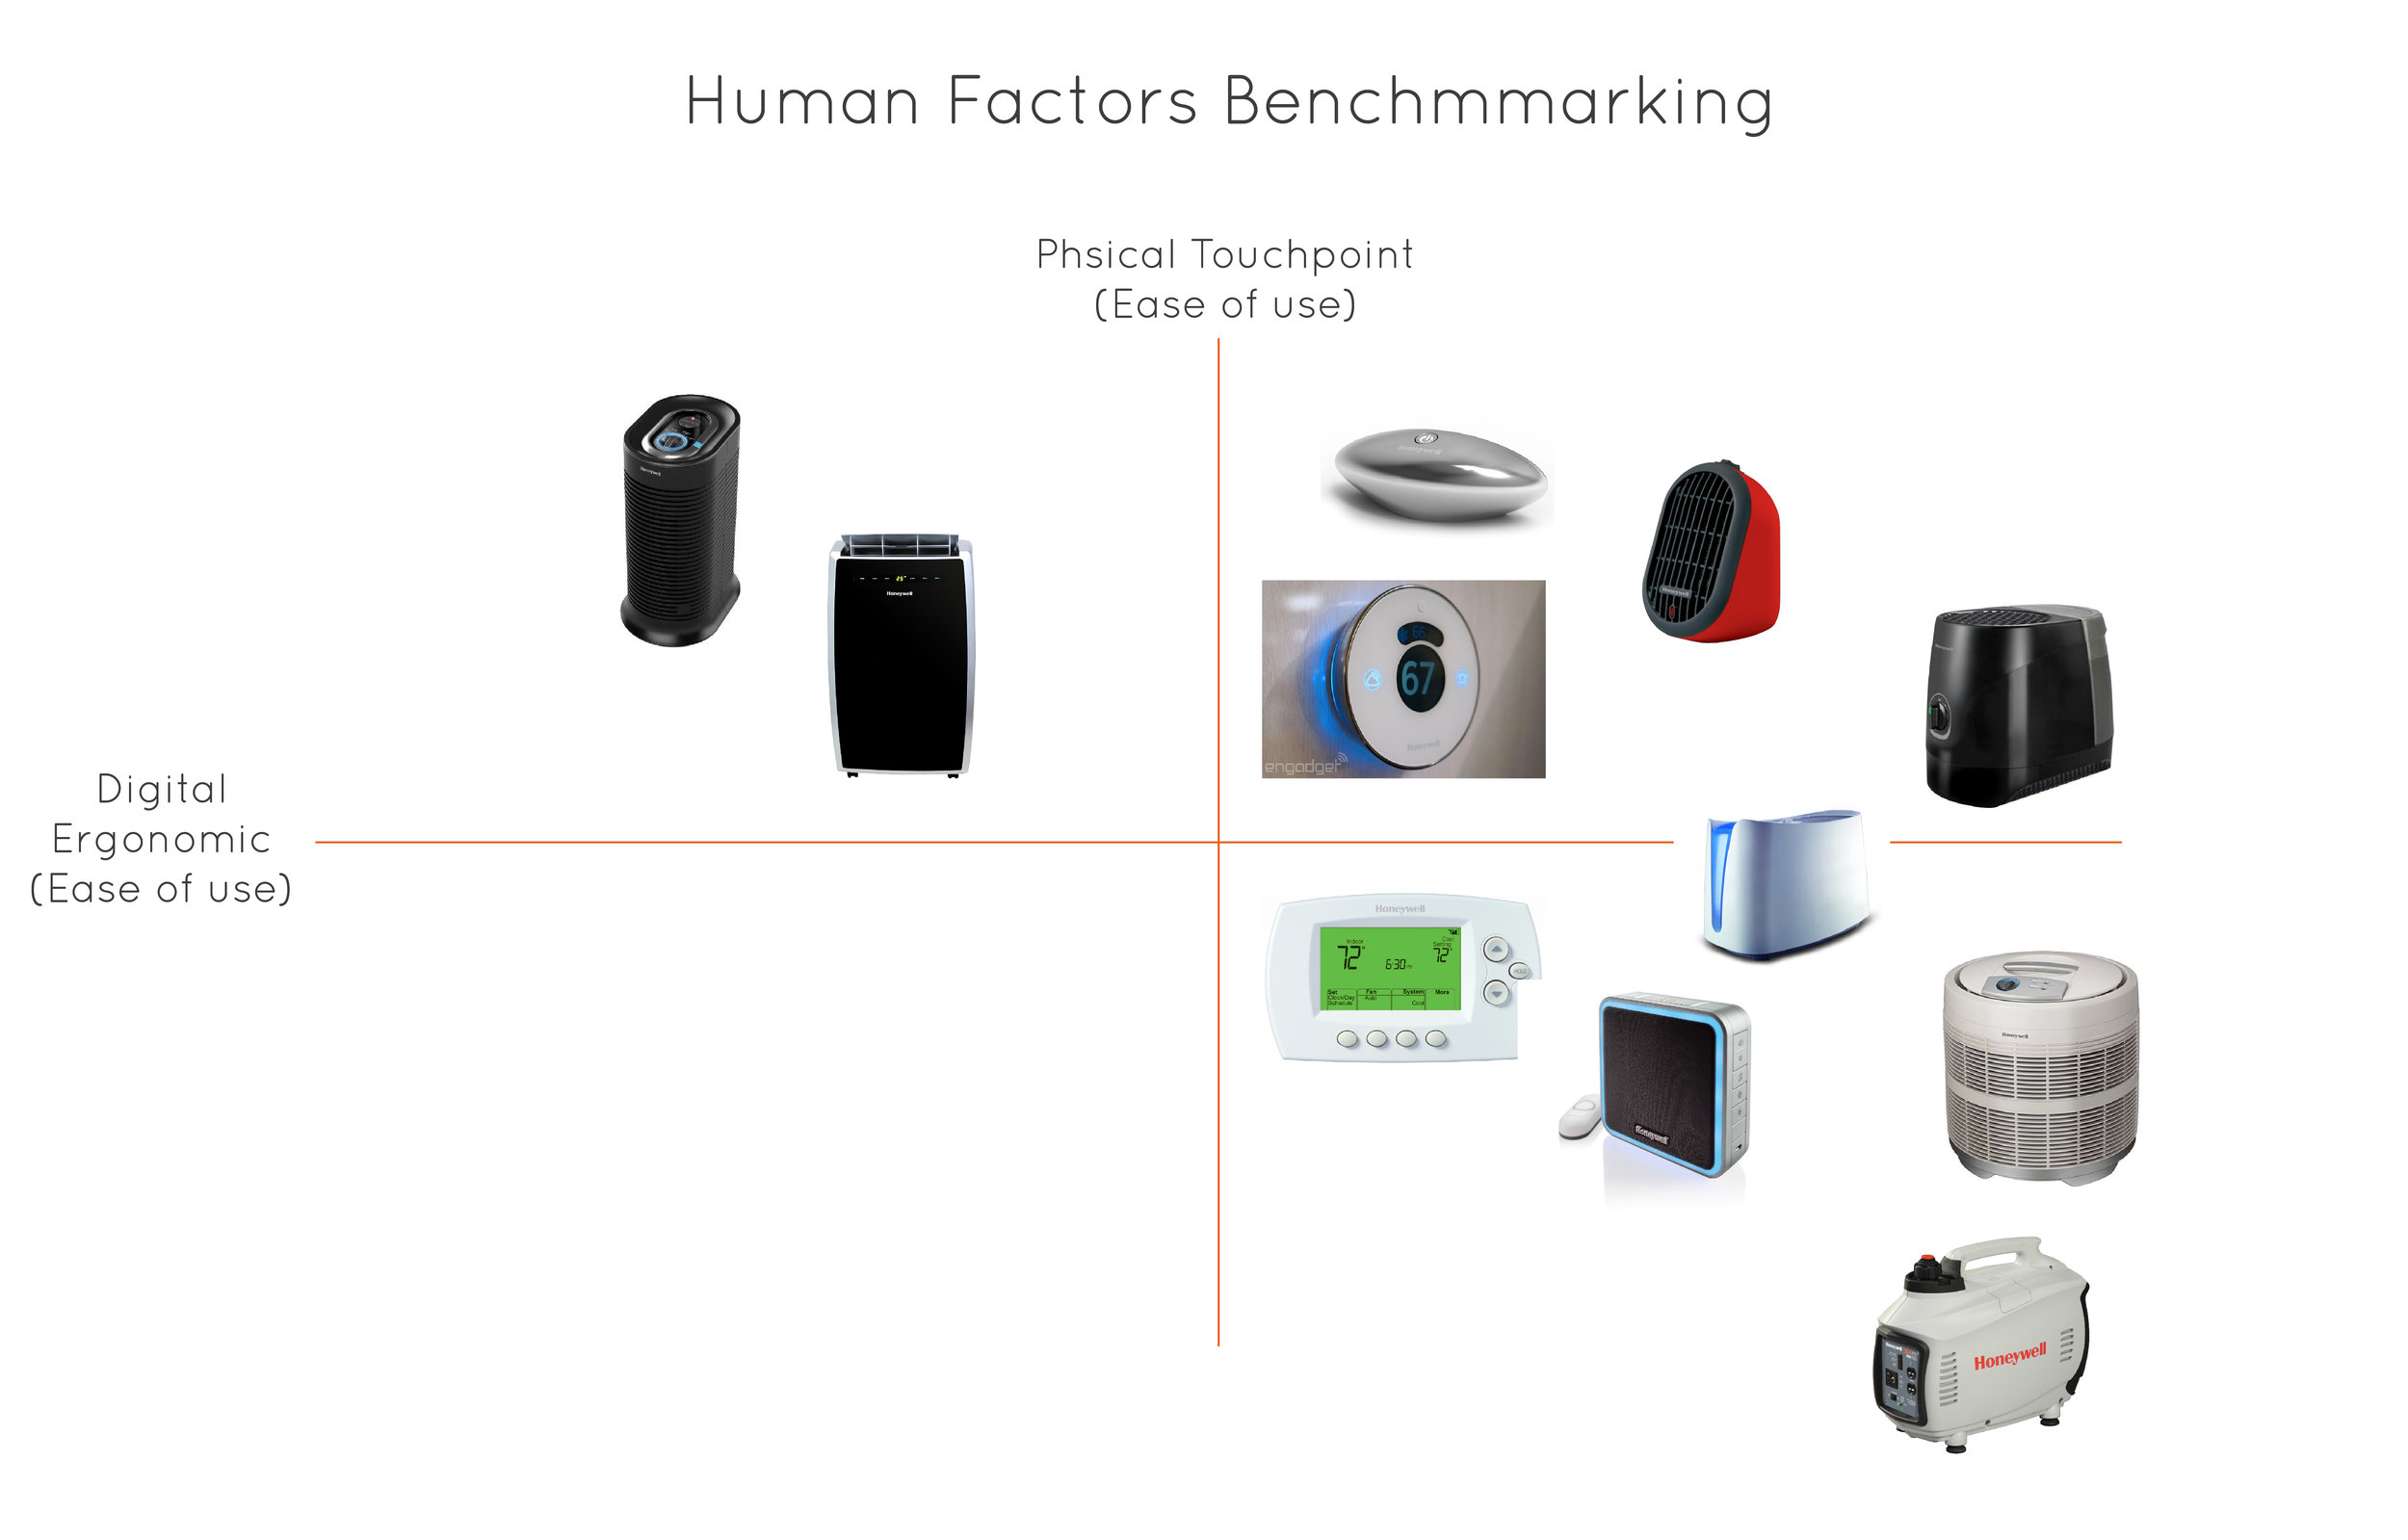 Human Factor Benchmarking-01.jpg